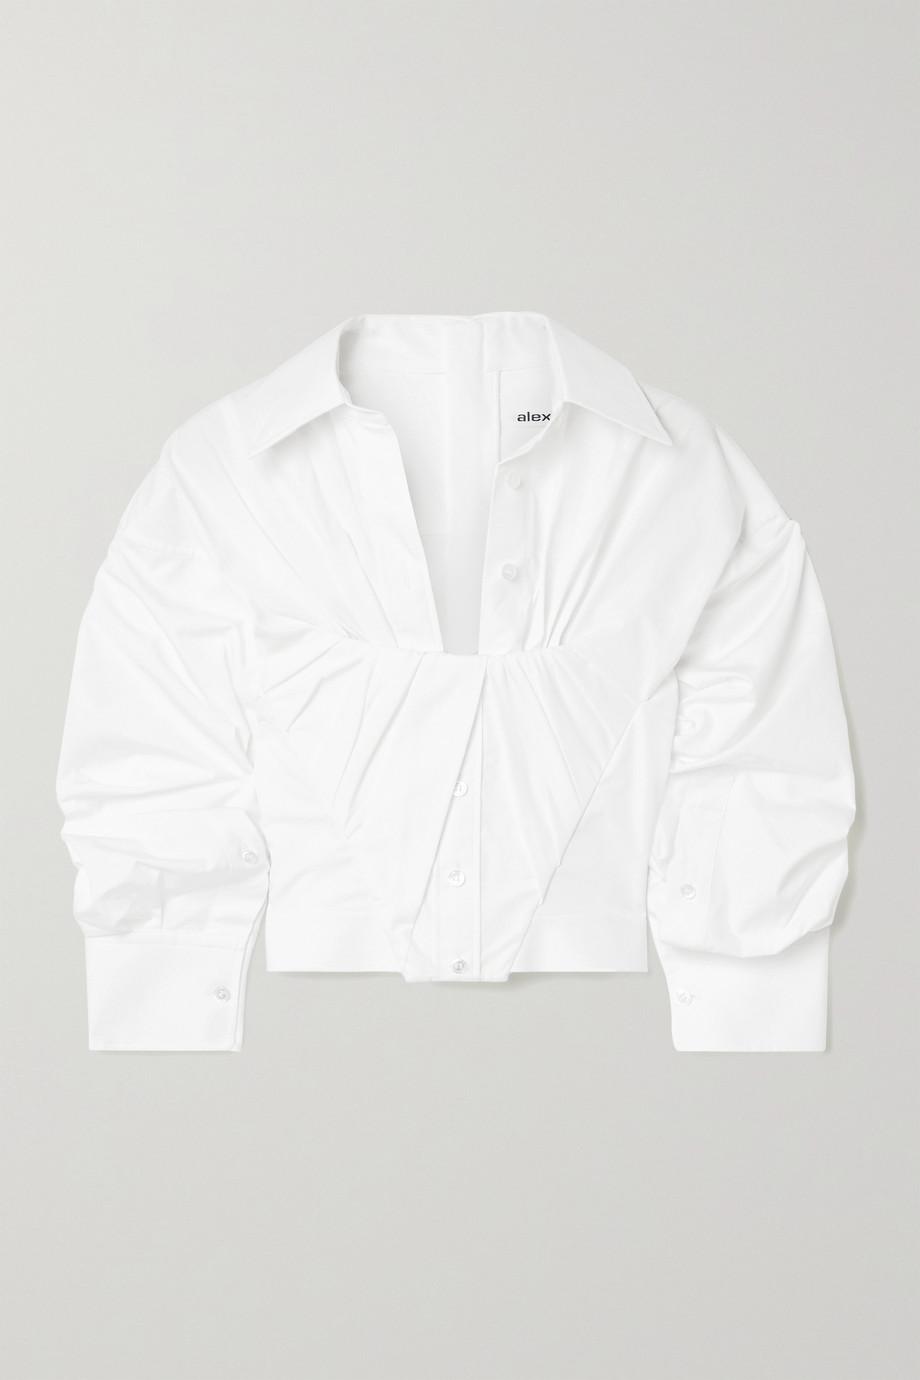 Alexander Wang 缩褶纯棉府绸短款衬衫